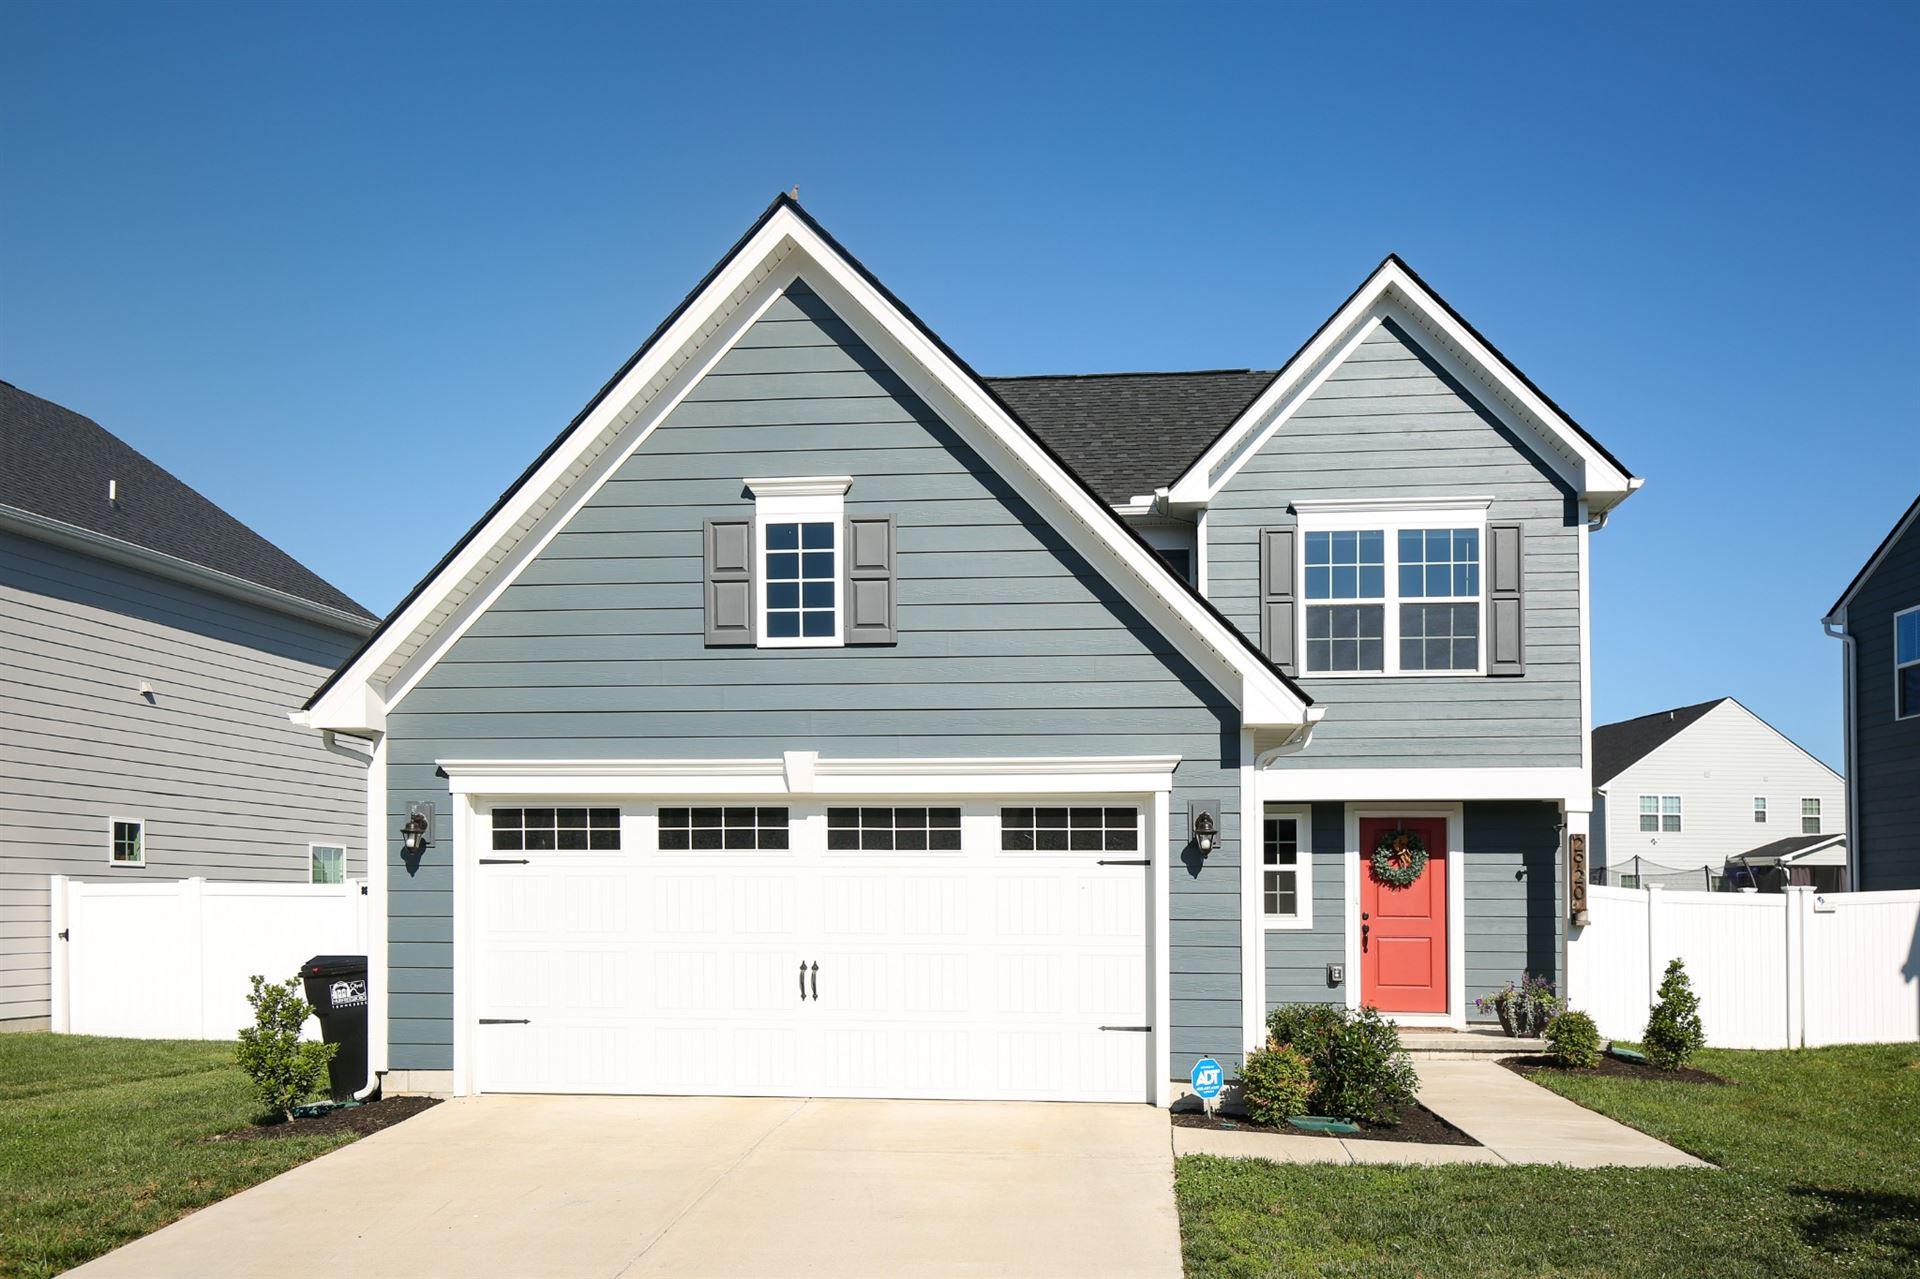 2920 Bluestem Ln, Murfreesboro, TN 37128 - MLS#: 2264008